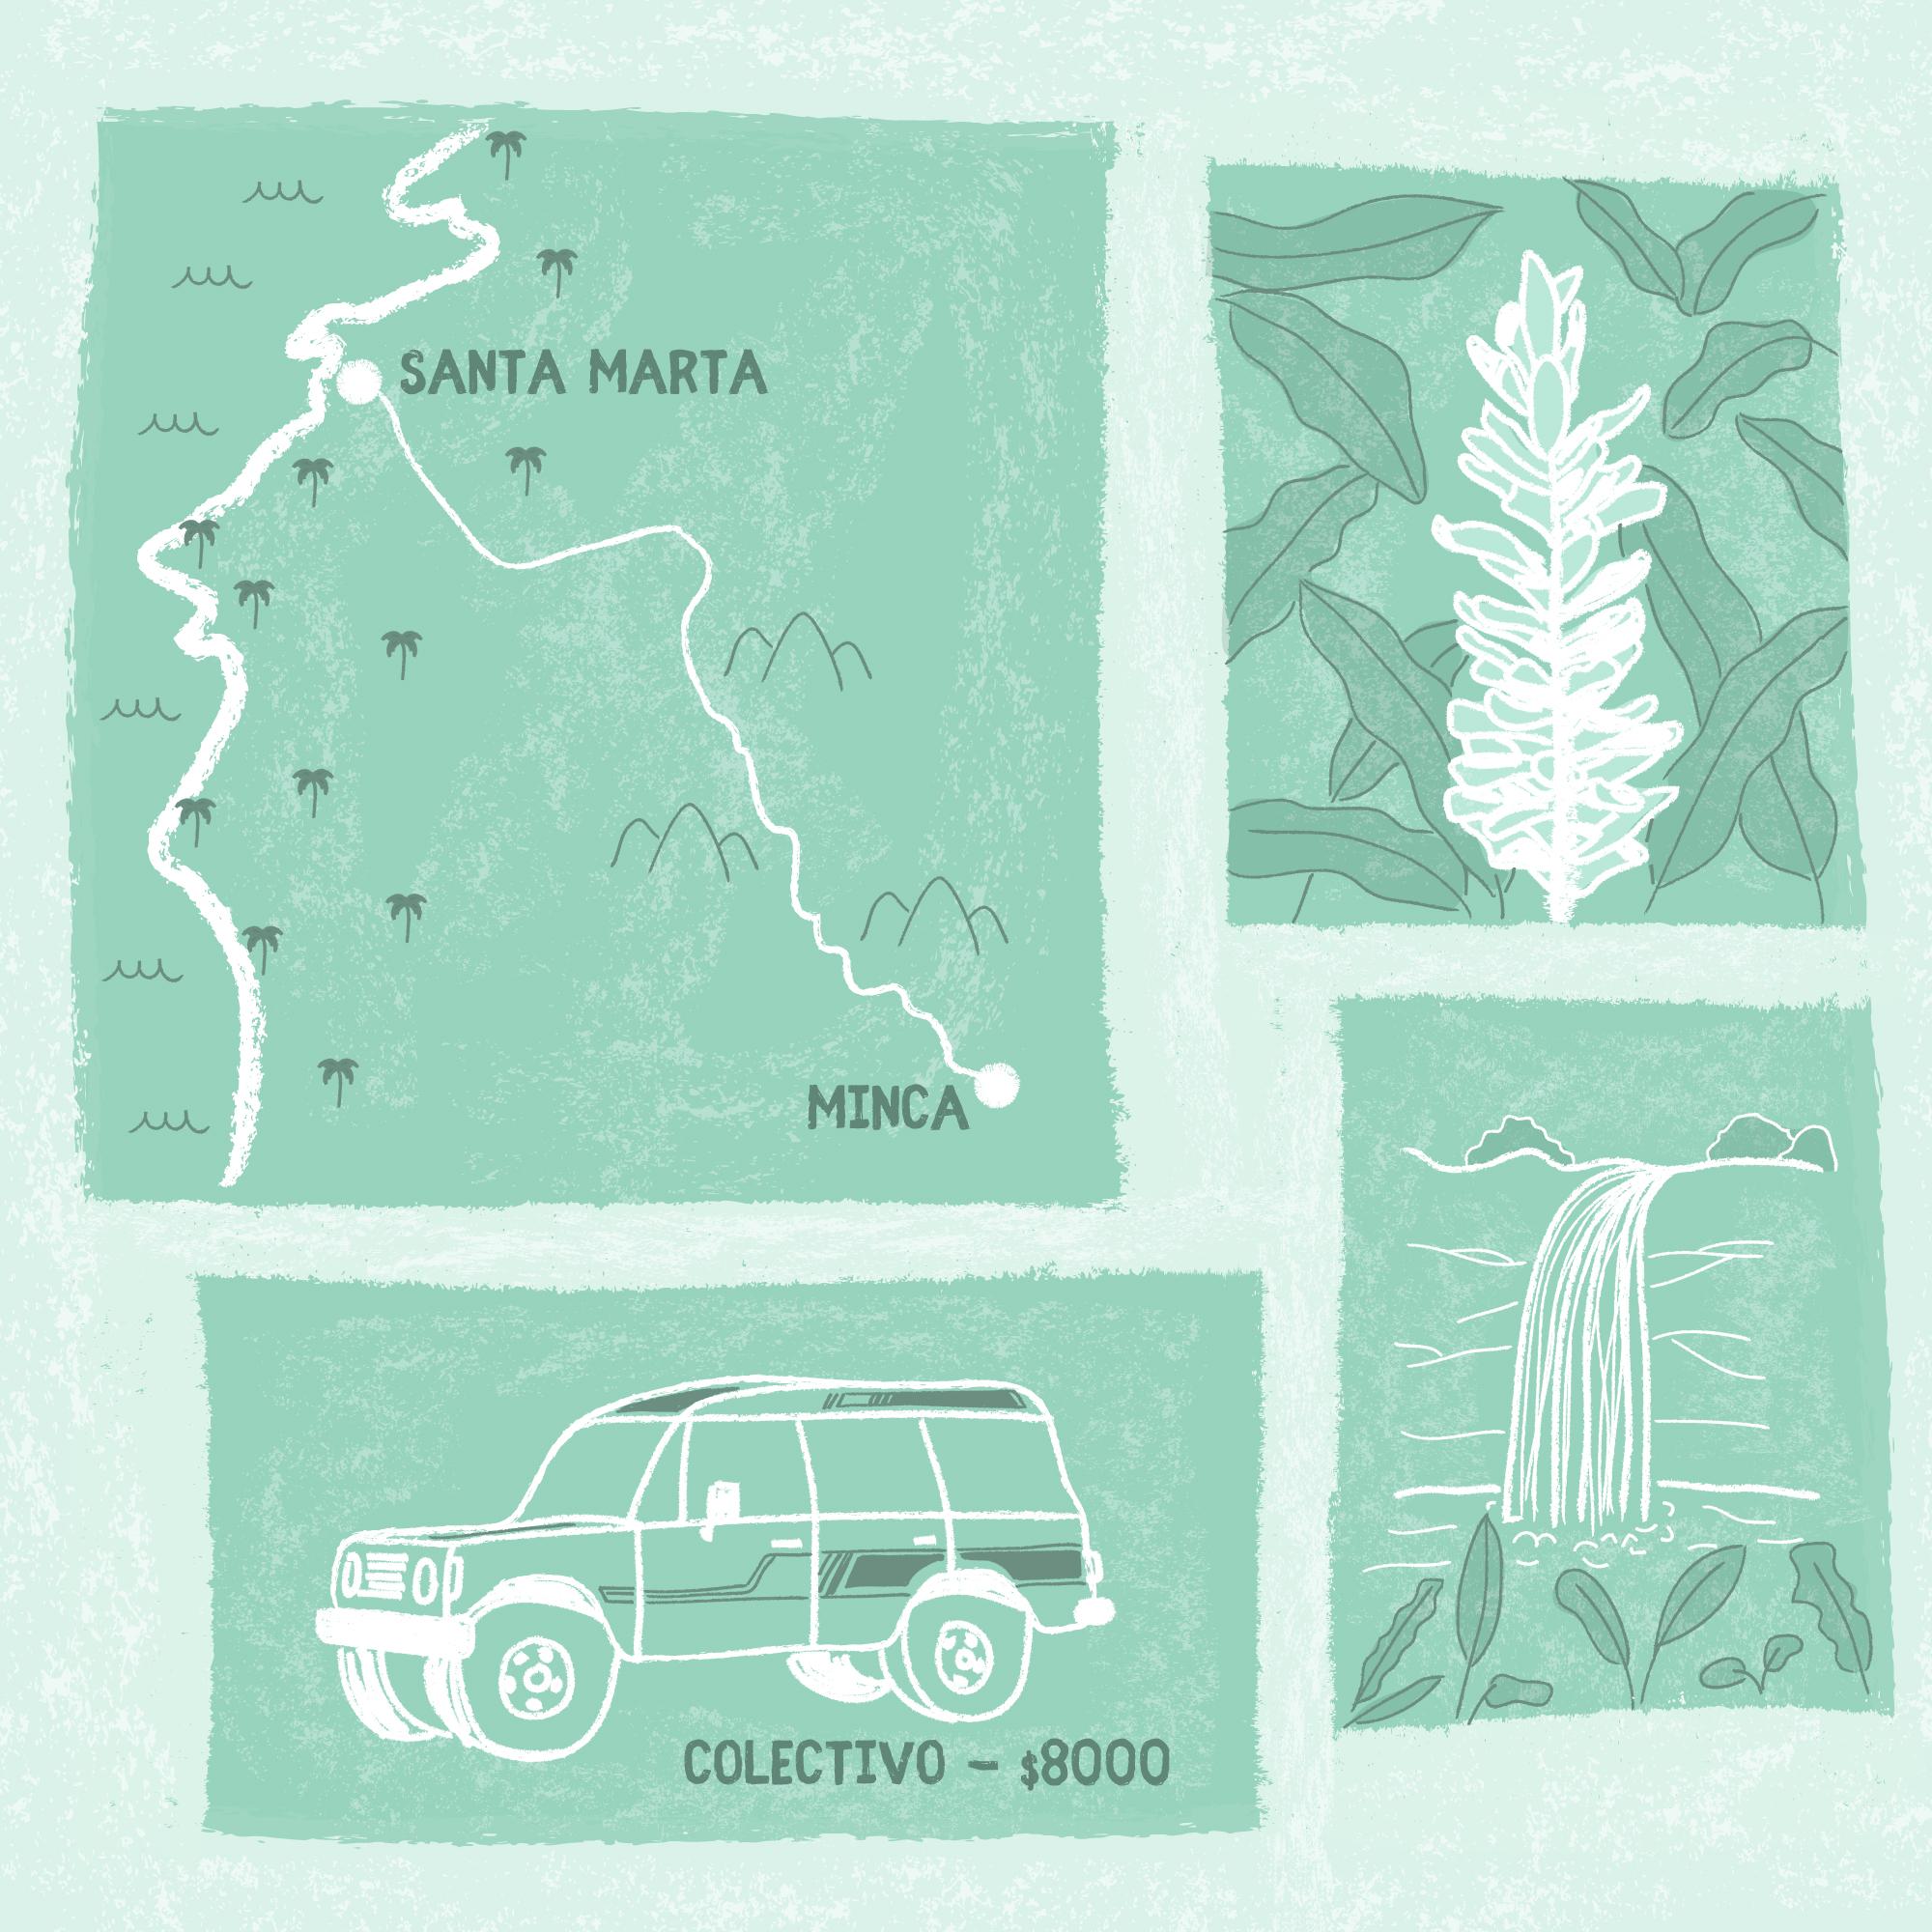 Minca, Colombia travel illustration